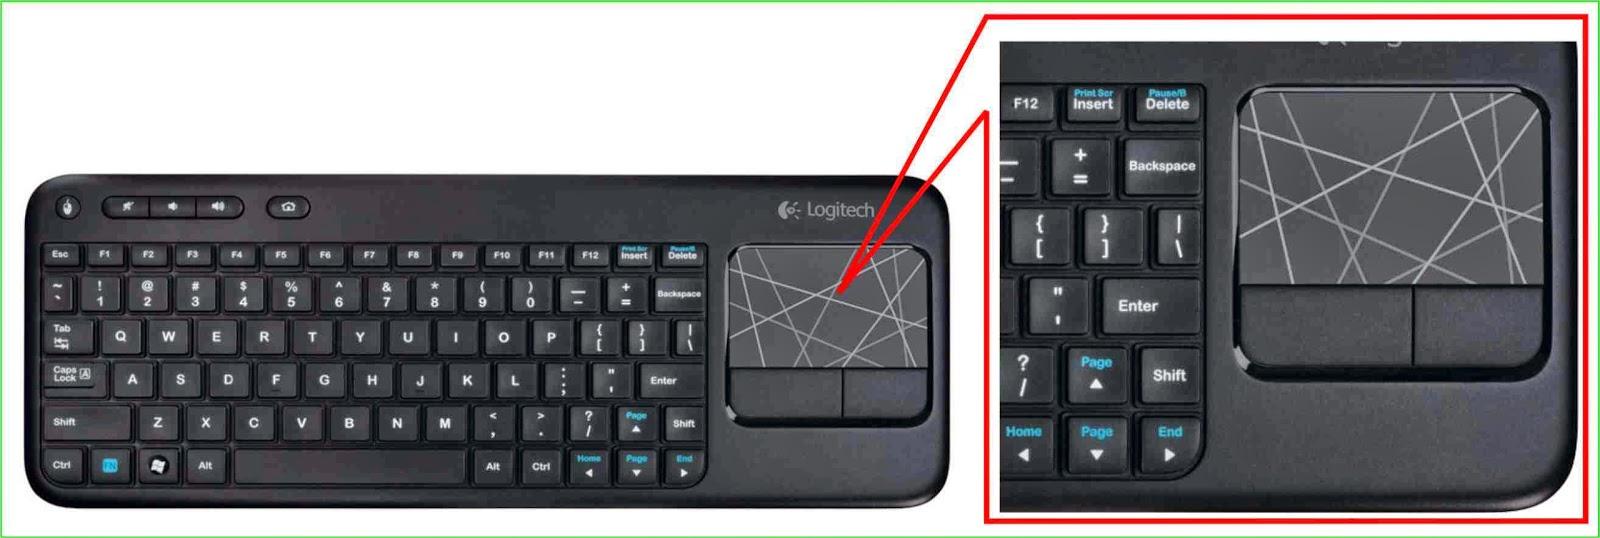 Touchpad pengganti mouse untuk PC